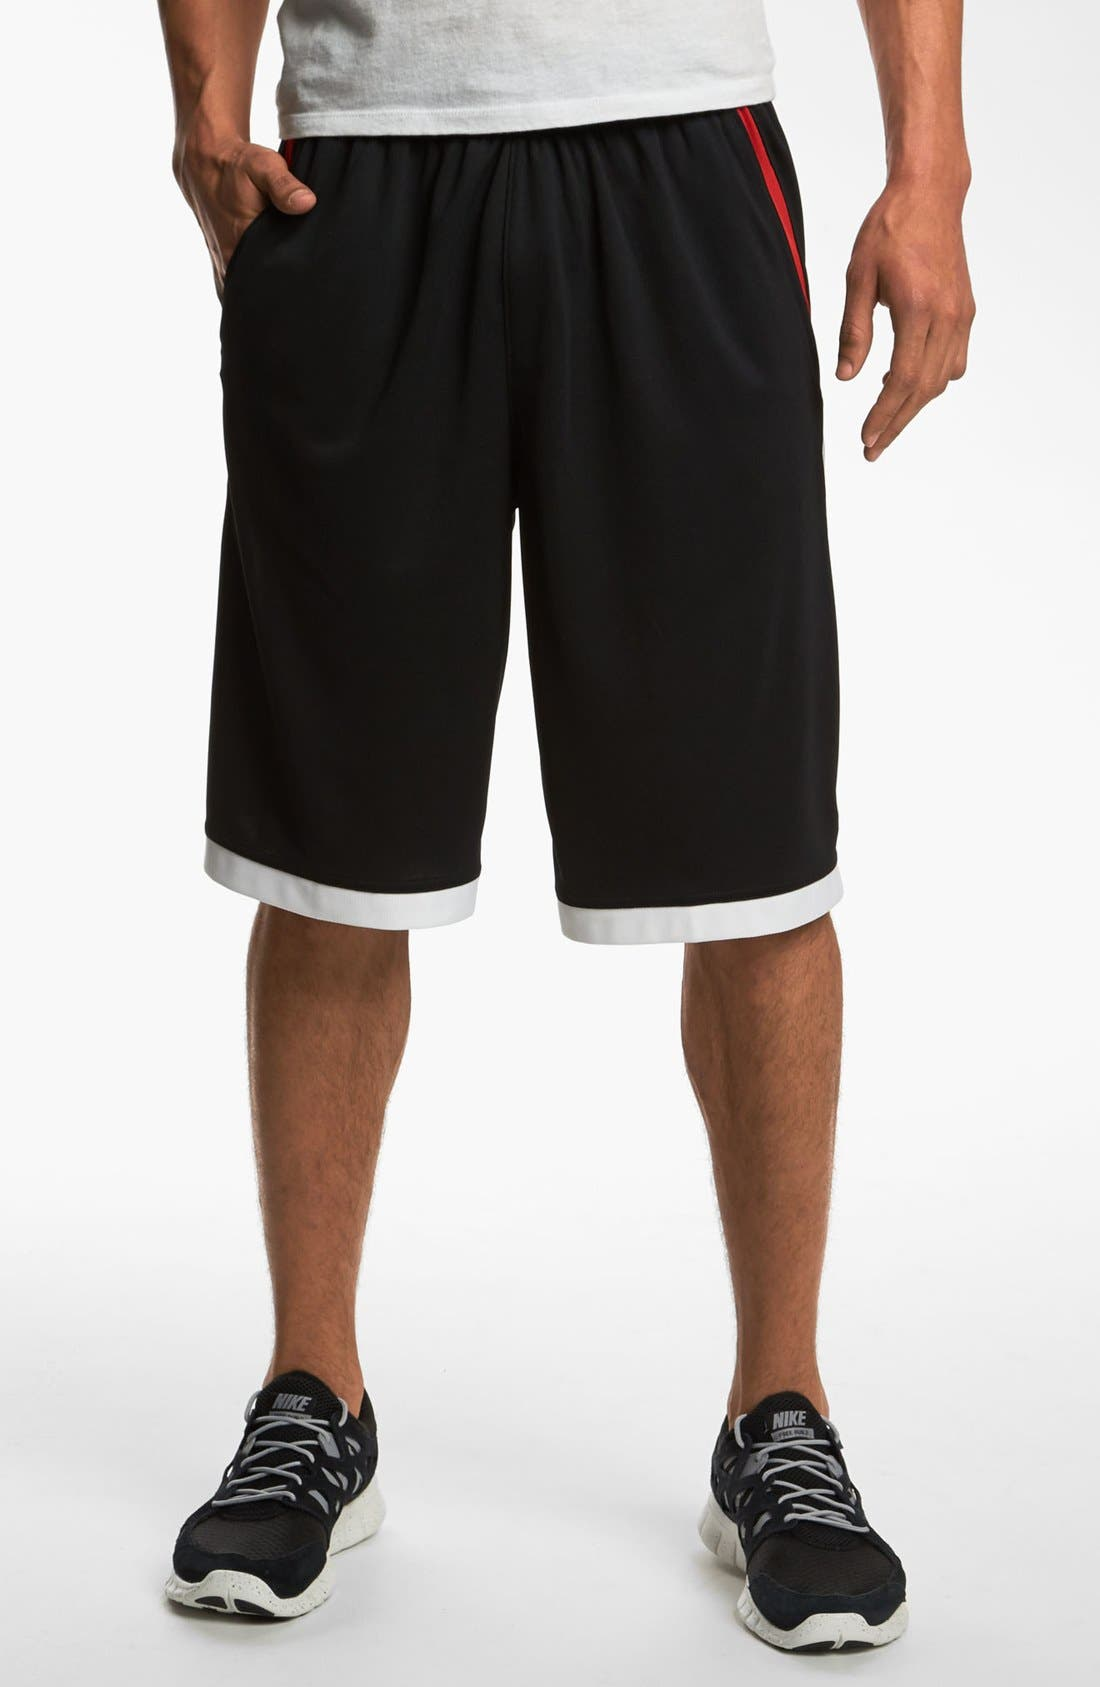 Alternate Image 1 Selected - Nike 'Contest' Shorts